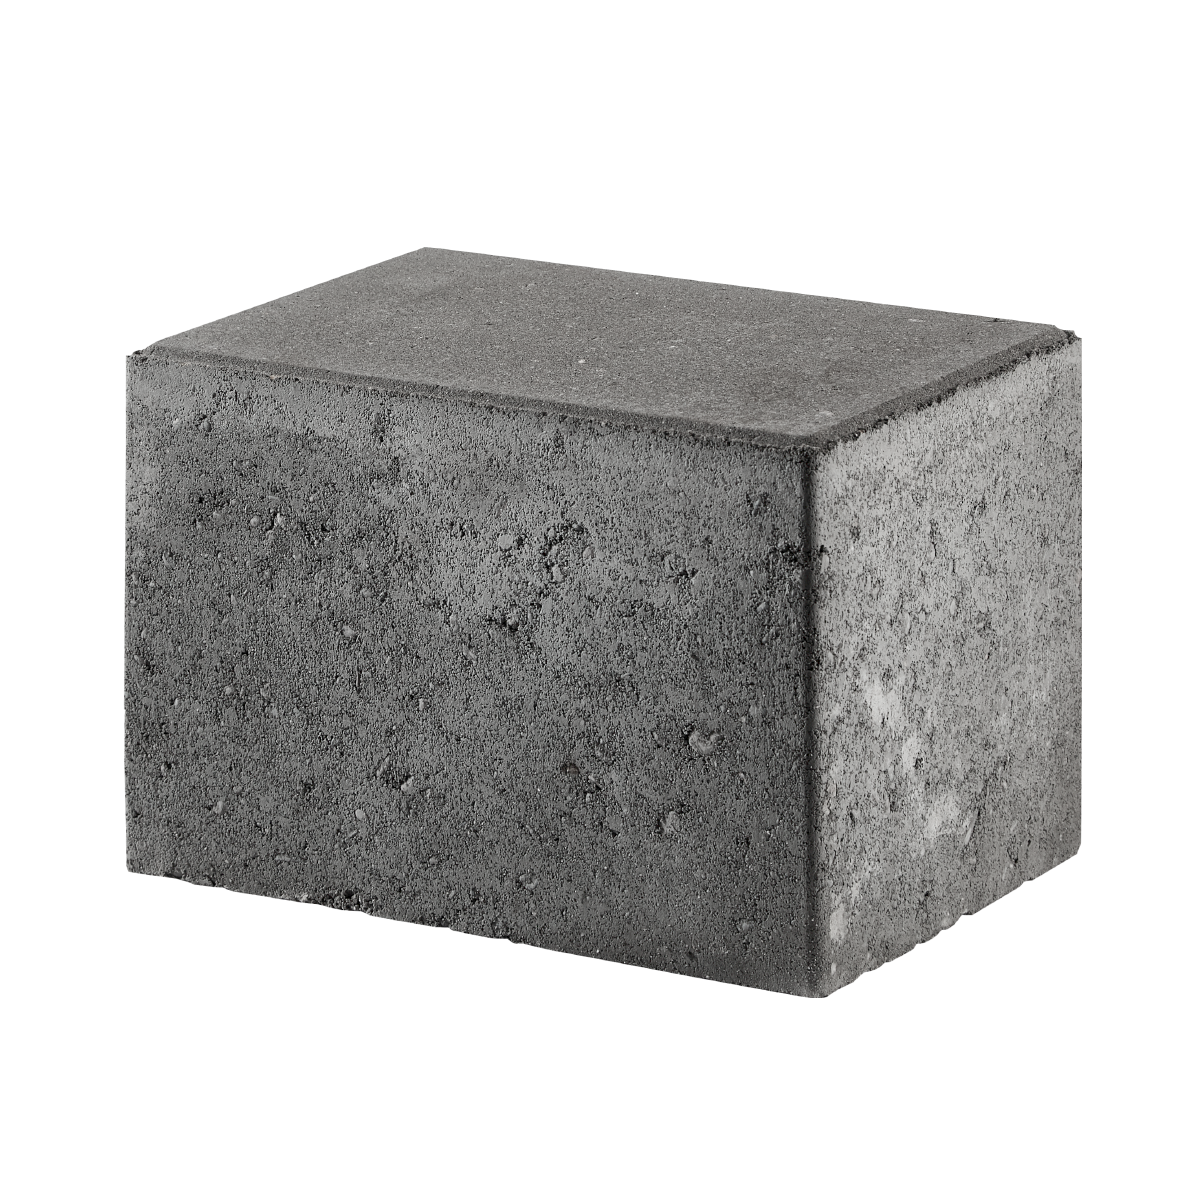 Bondesten 14x21x14 cm Gråmix Kantblokke